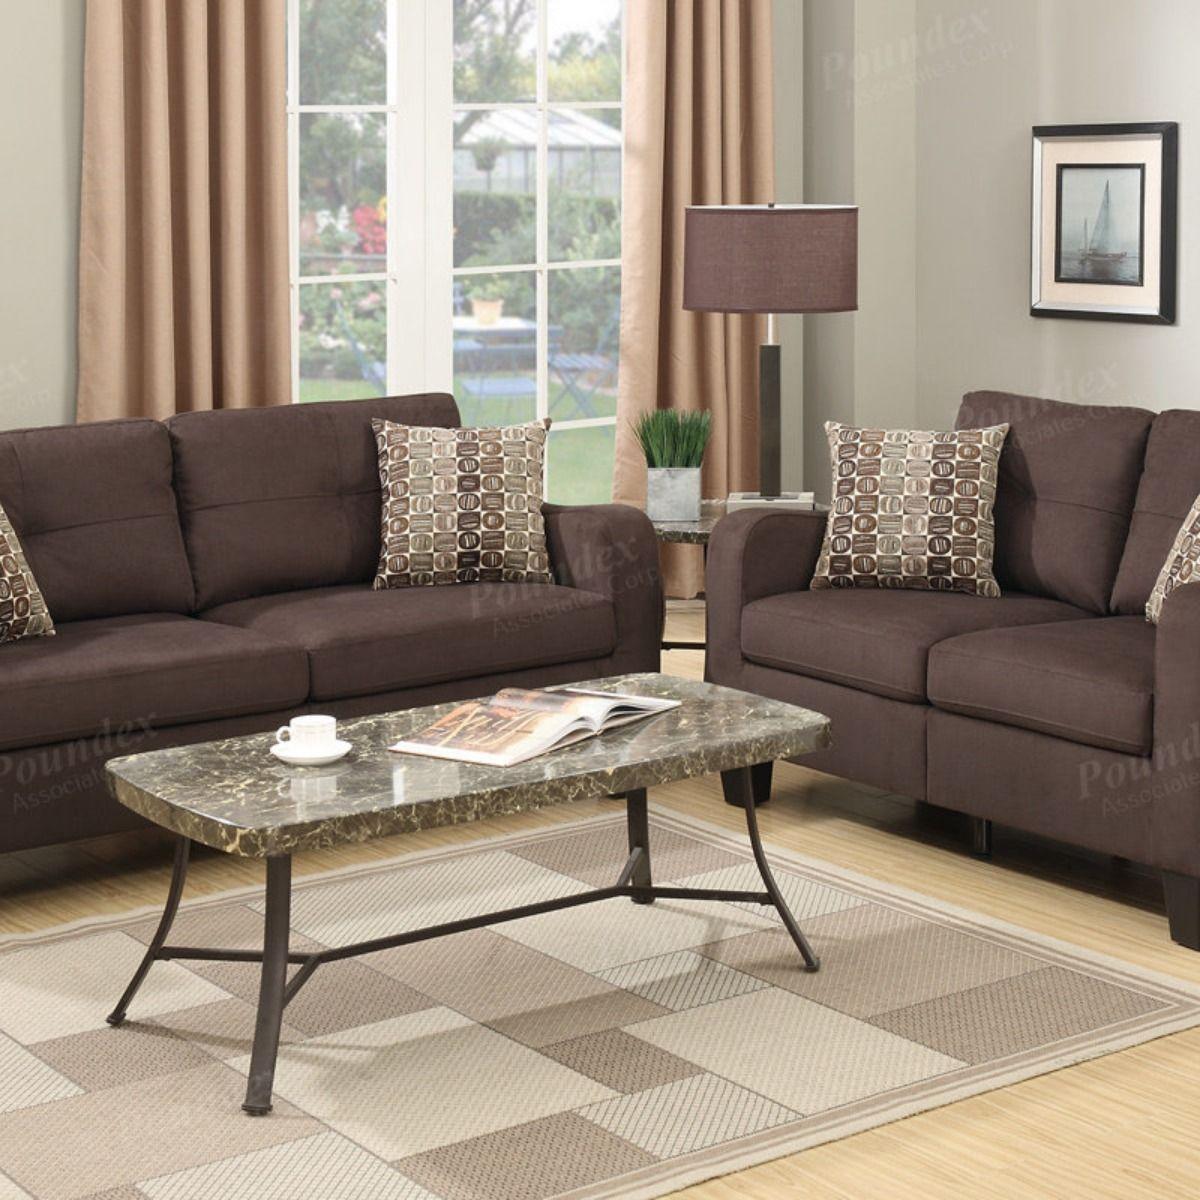 2 Pcs Sofa Set Brown Polyfiber 379 00 Sofa Set Home Decor Love Seat